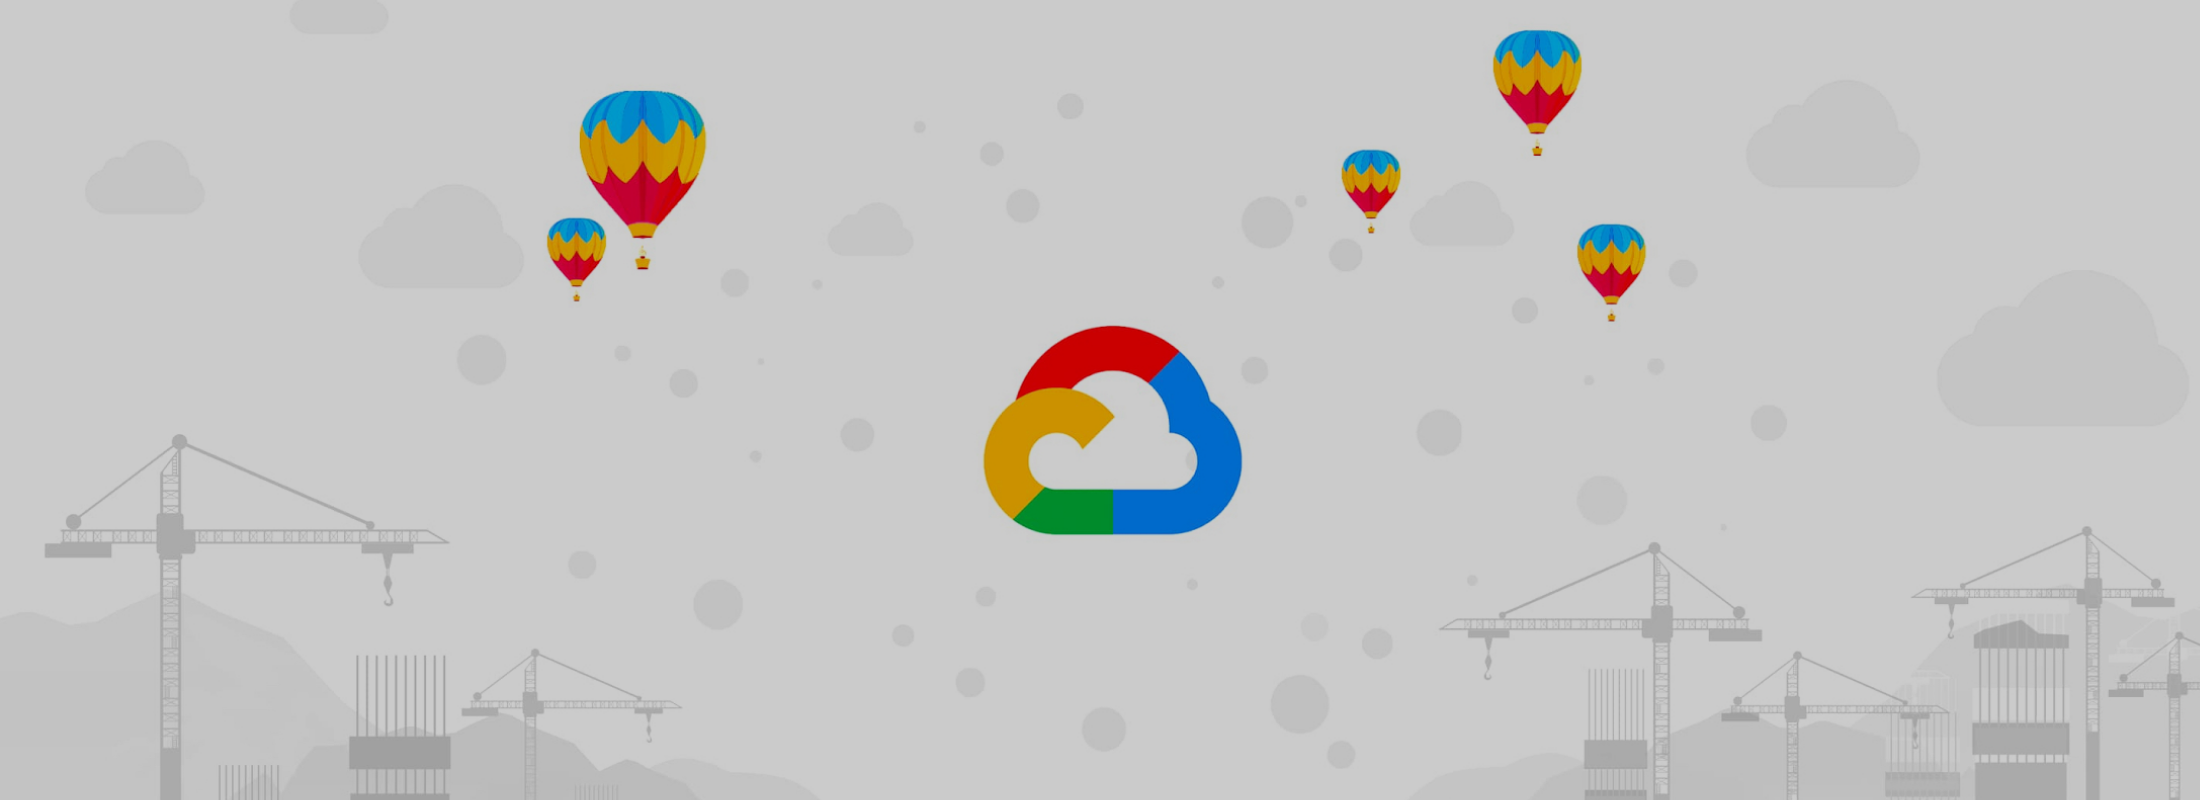 Streamlining Cloud Run development with Cloud Code